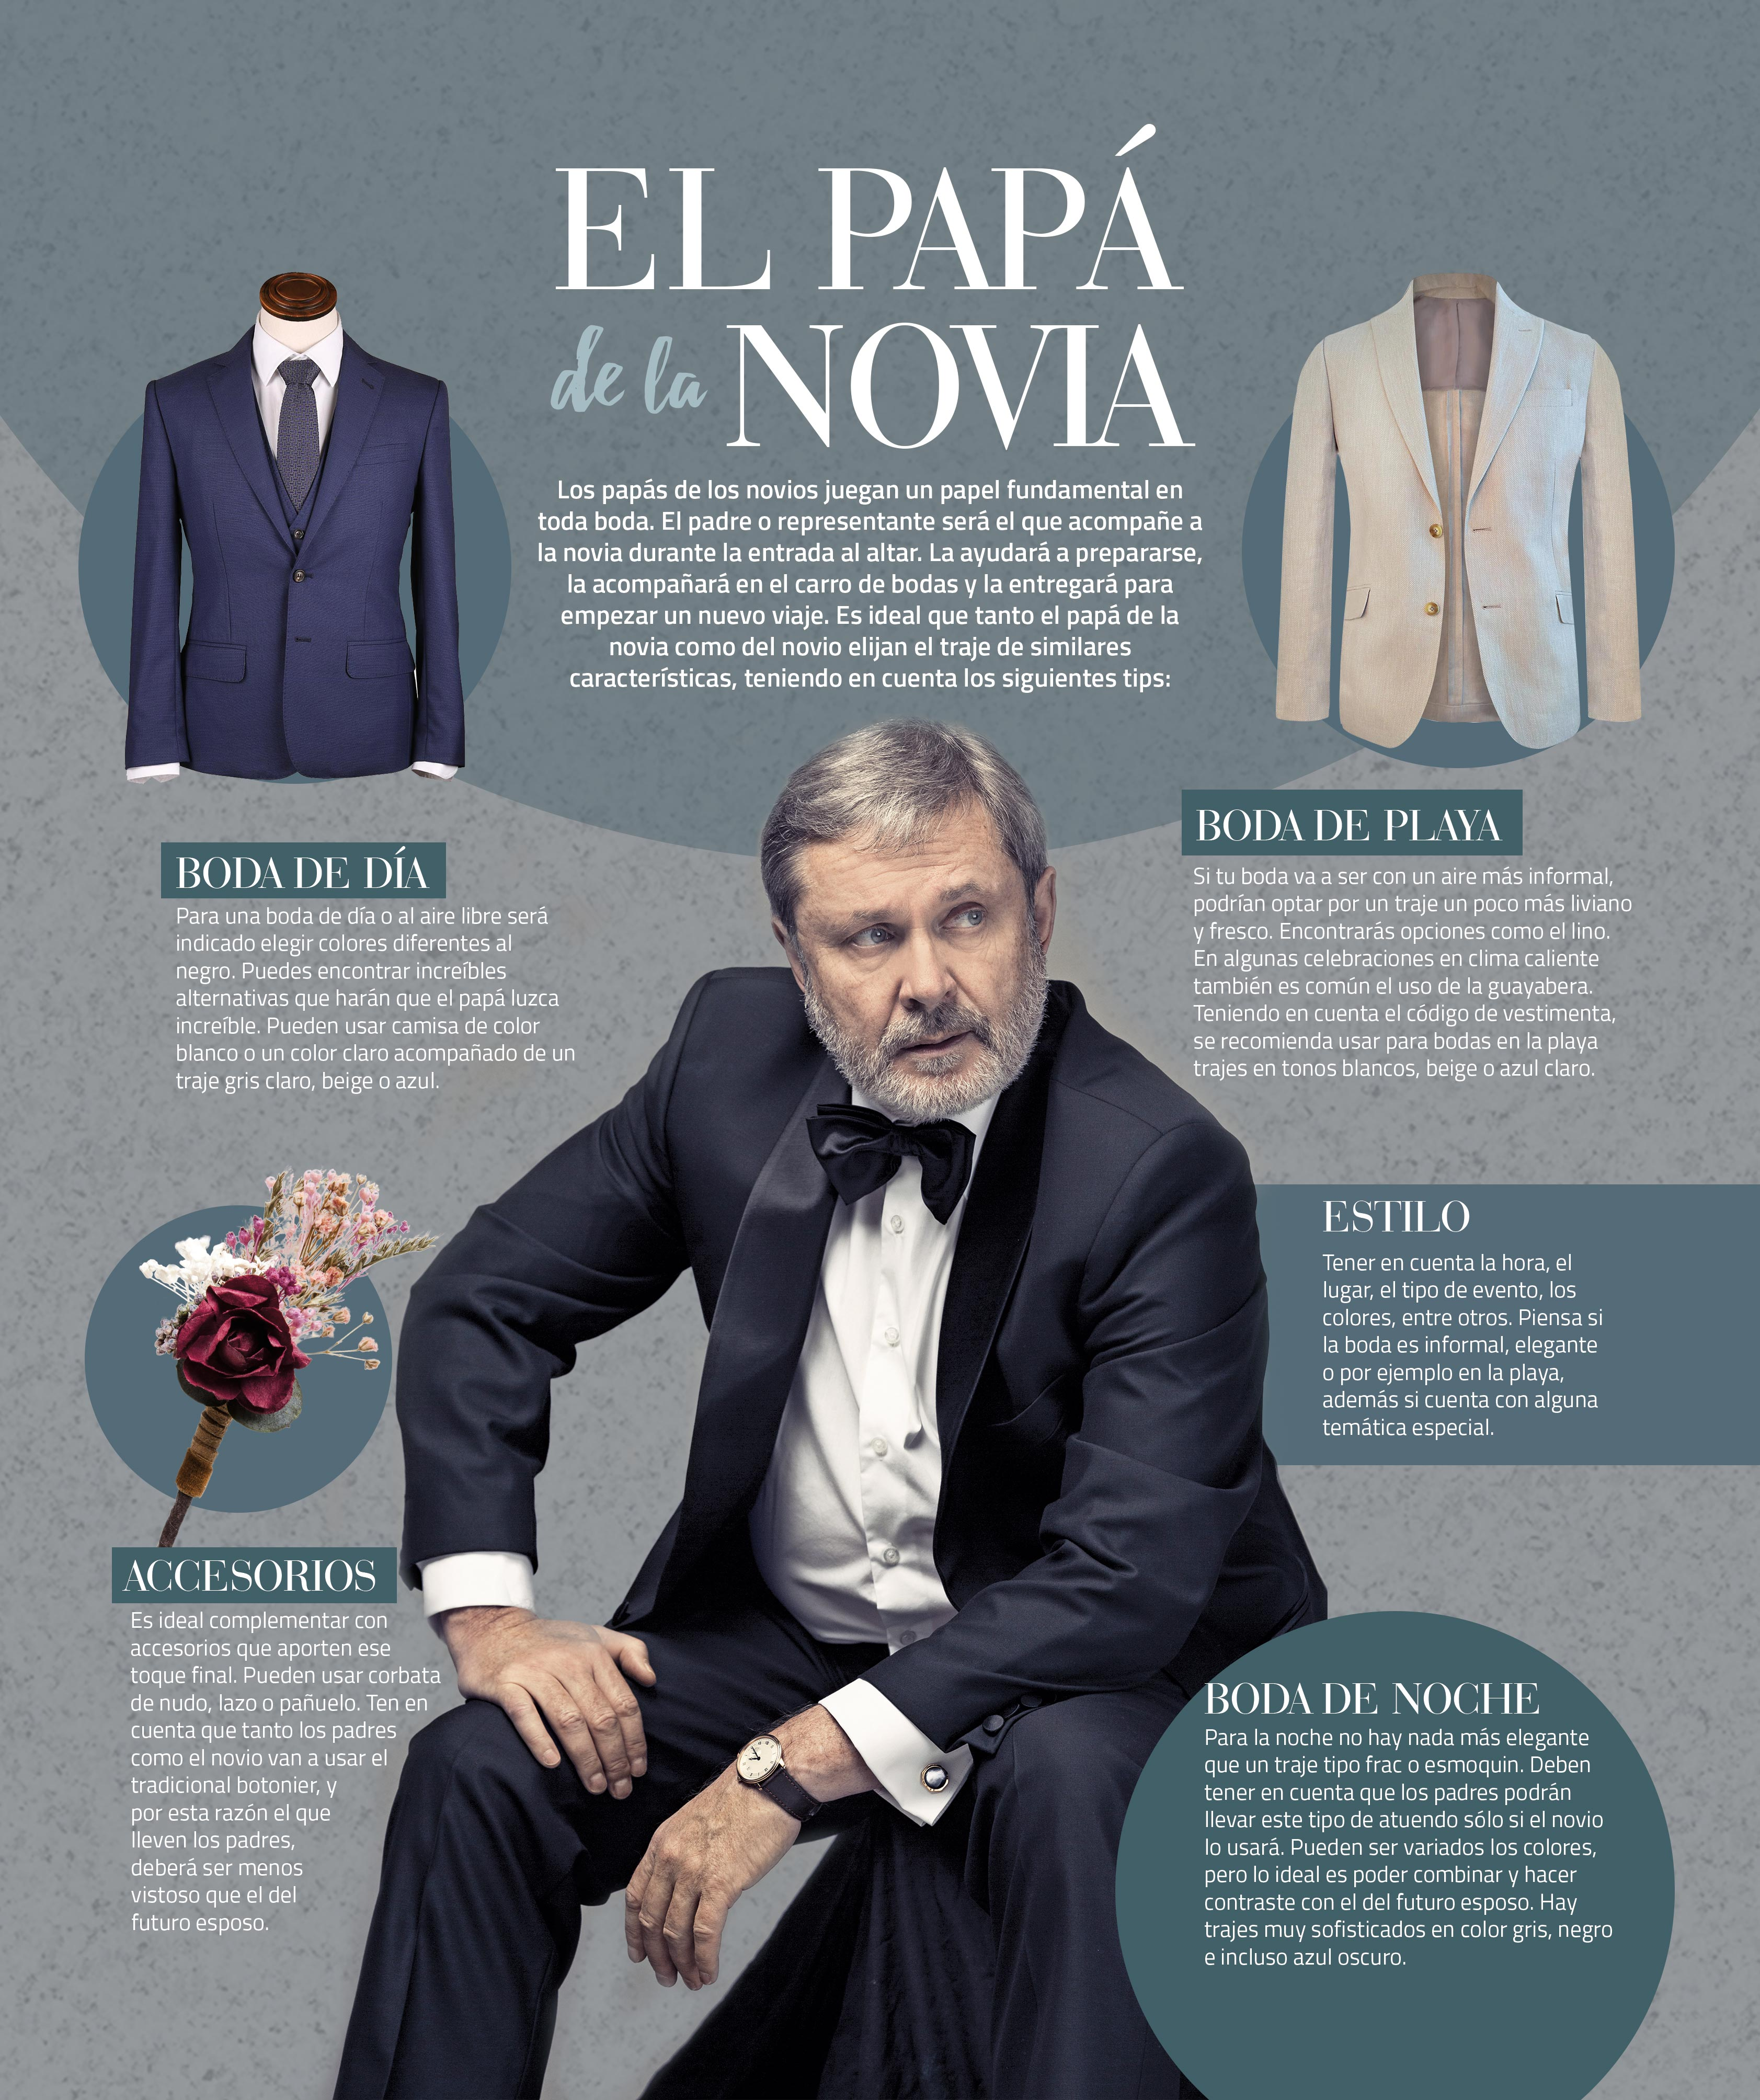 EL-PAPA-DE-LA-NOVIA